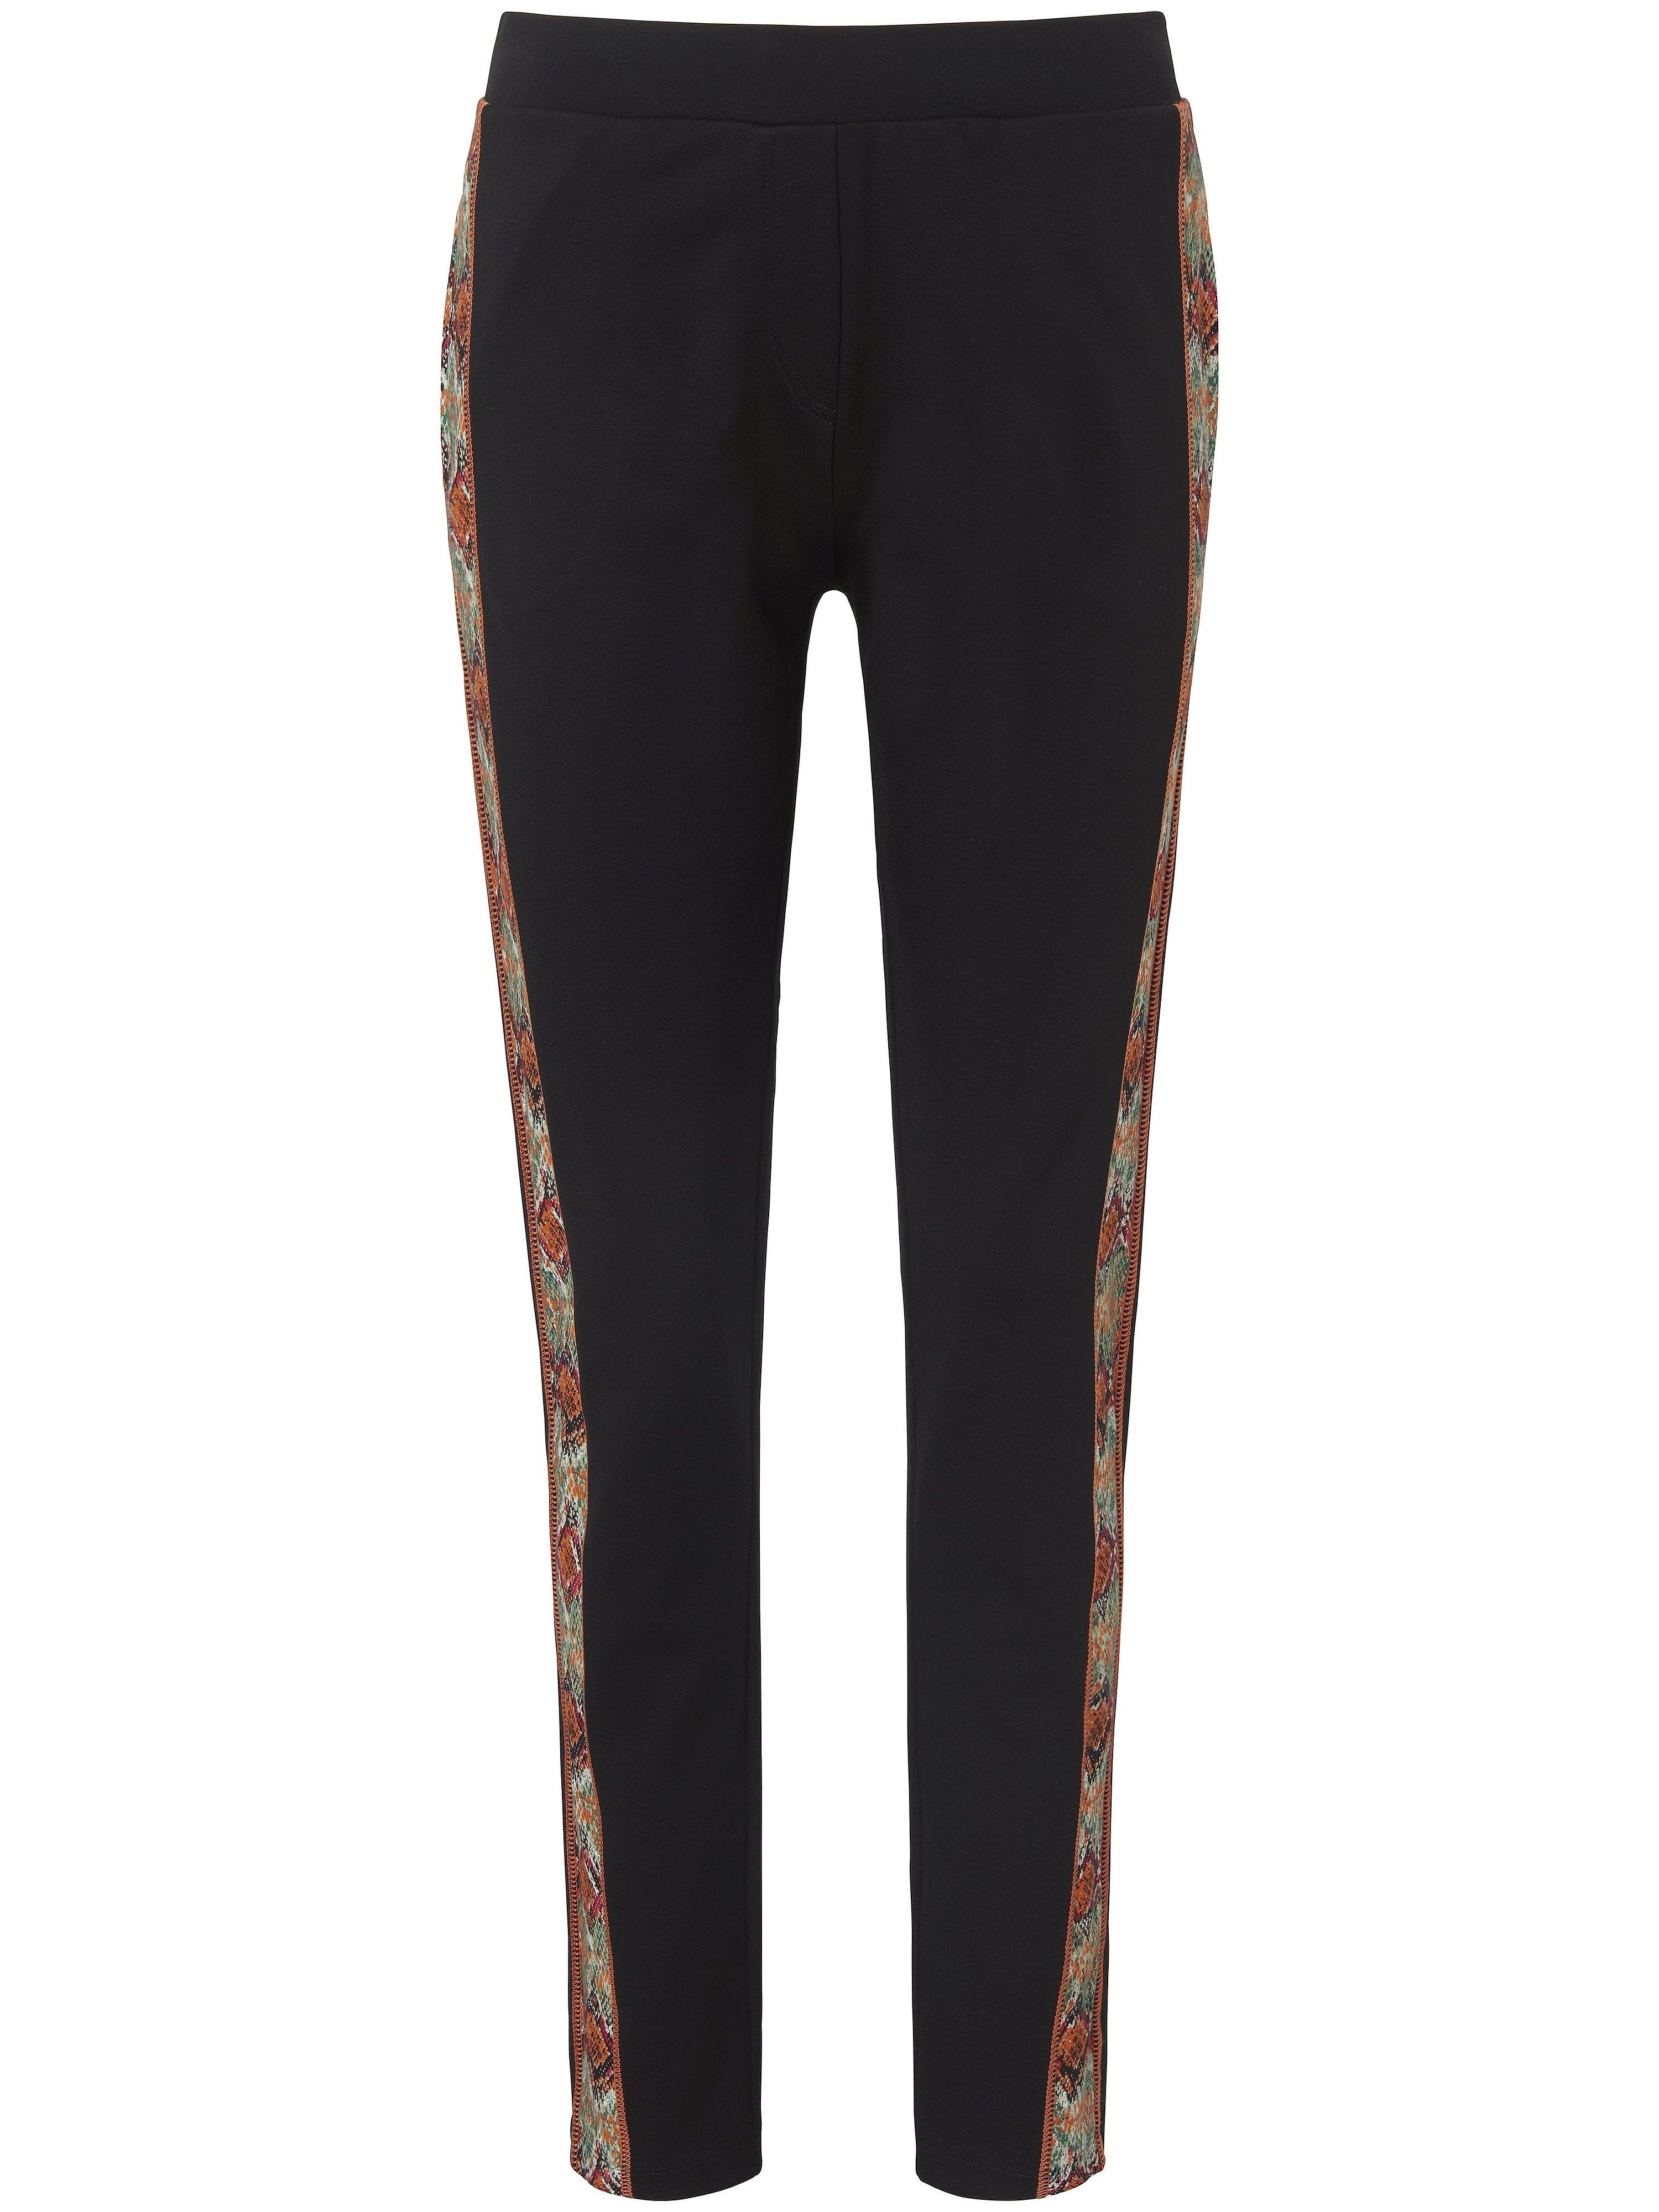 Le pantalon en jersey interlock noir - MYBC - Modalova